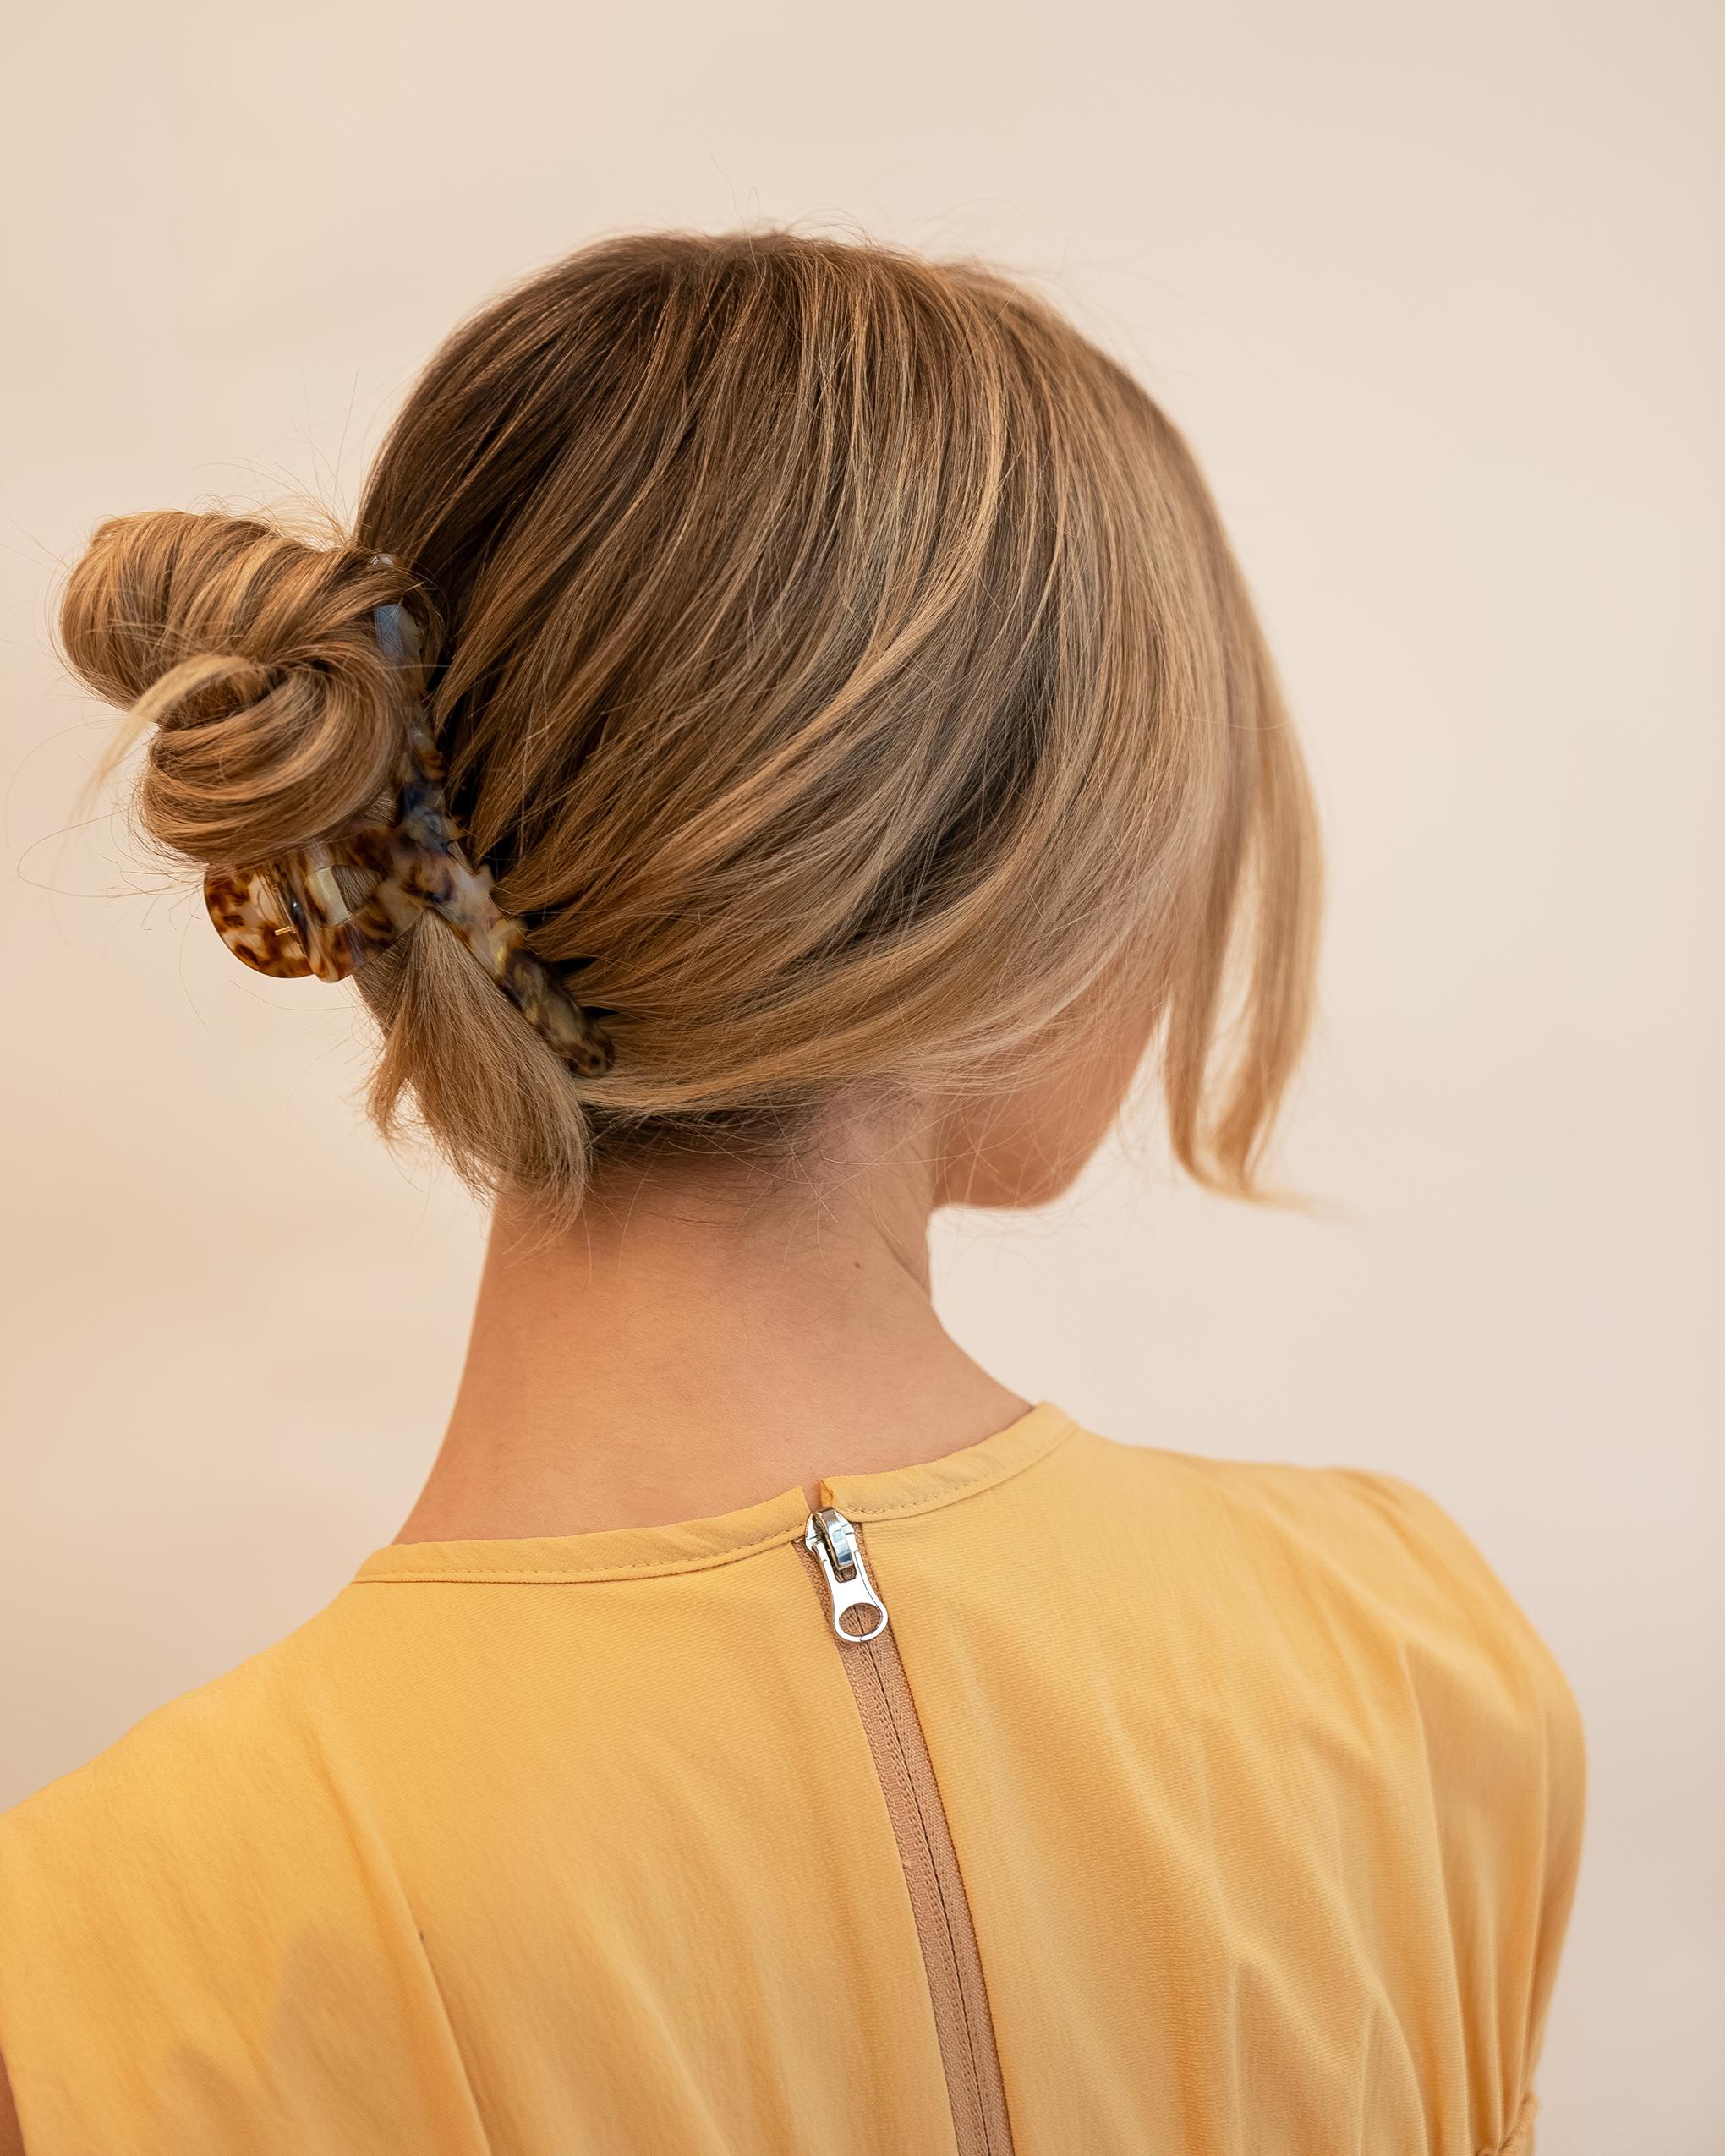 Model wearing Emin + Paul tortoiseshell angular hair claw.